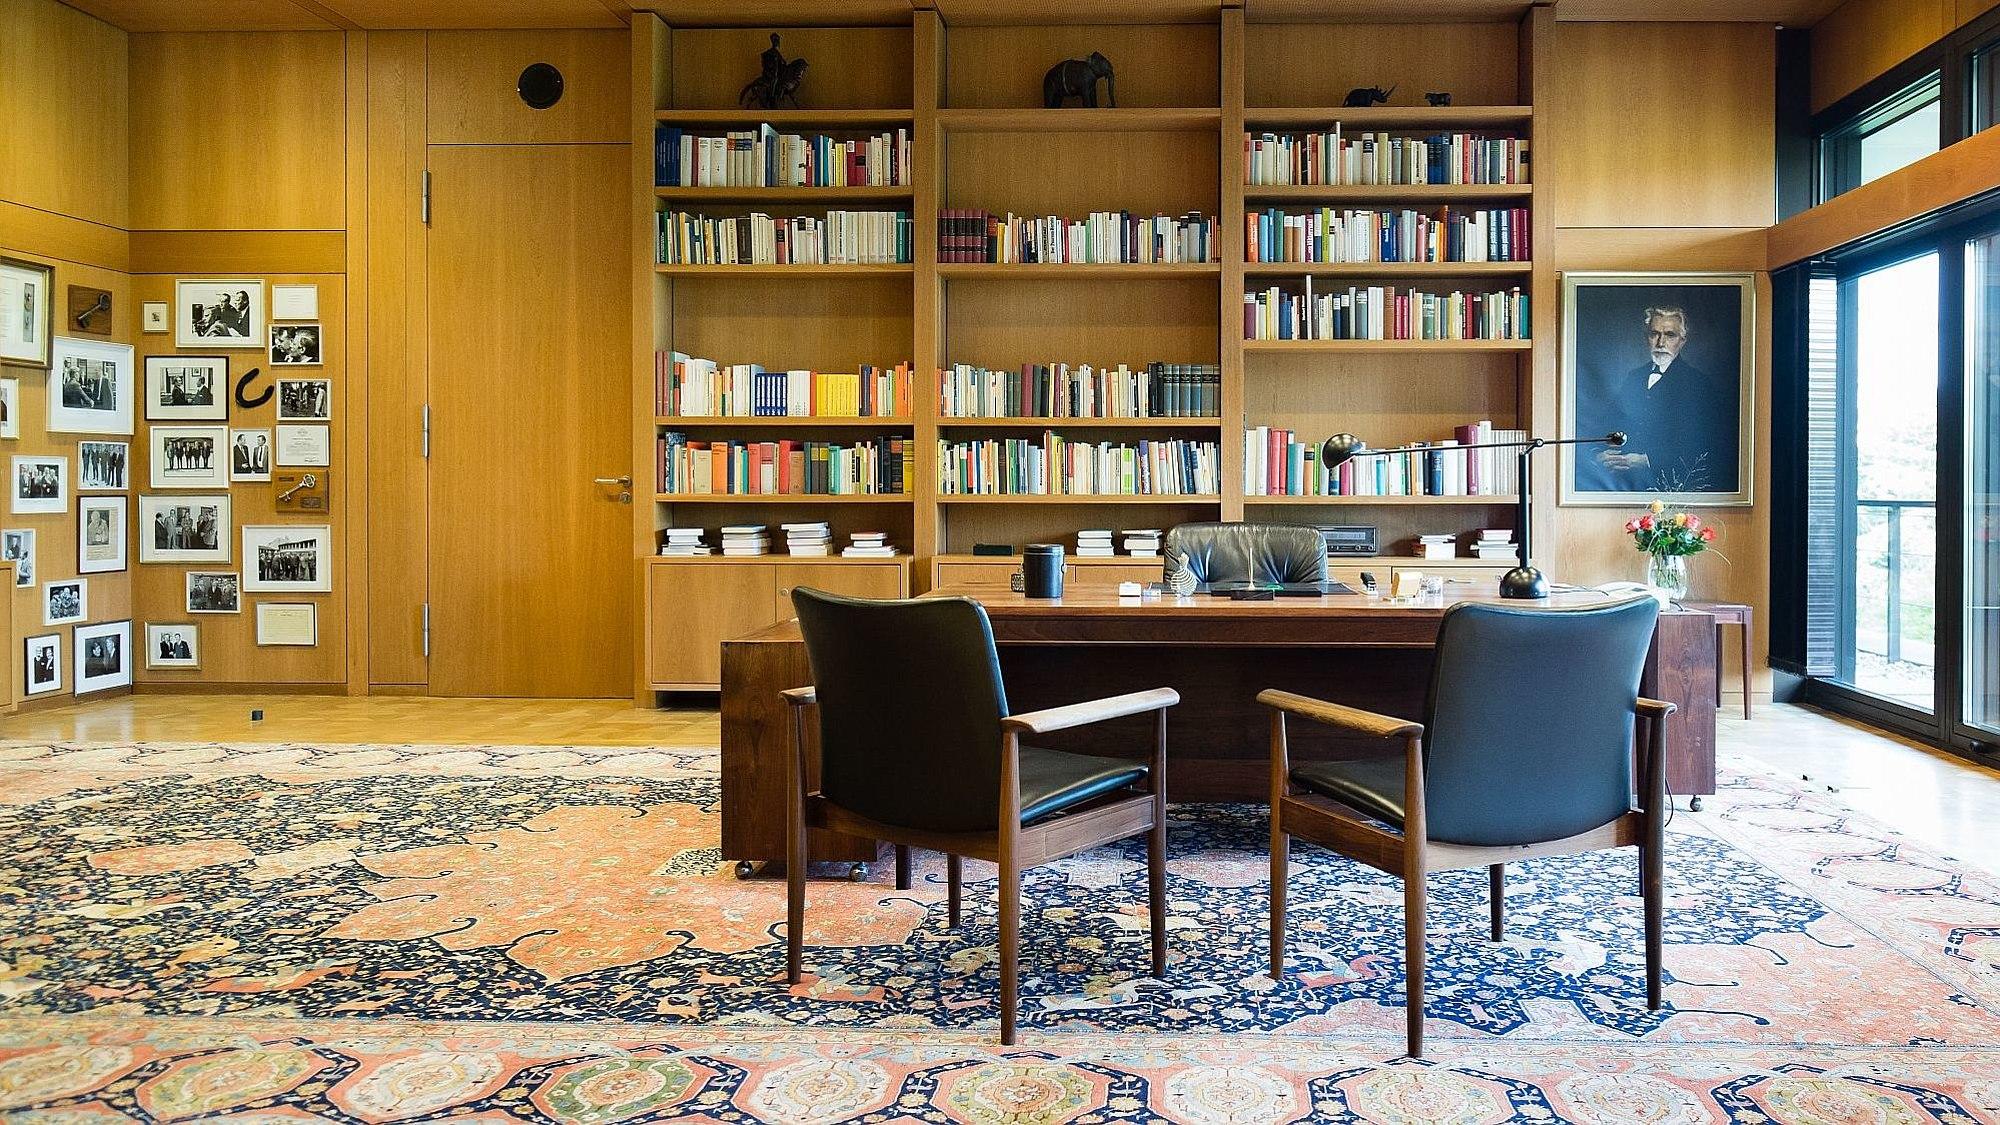 historische orte in bonn. Black Bedroom Furniture Sets. Home Design Ideas